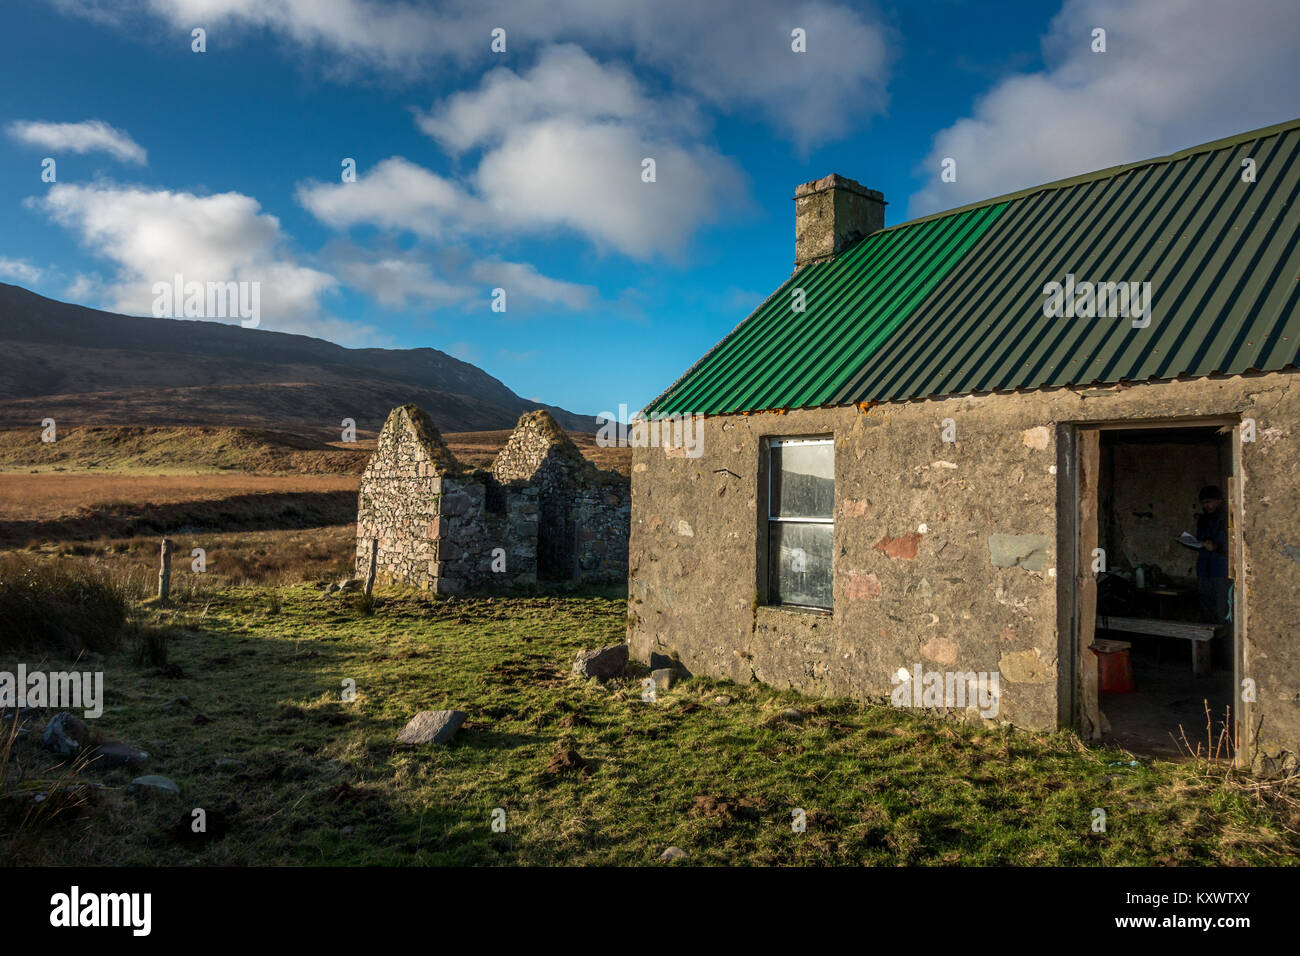 Landscape outside Proaig Bothy and ruined settlement, near Ardtalla, Isle of Islay, Scotland - Stock Image